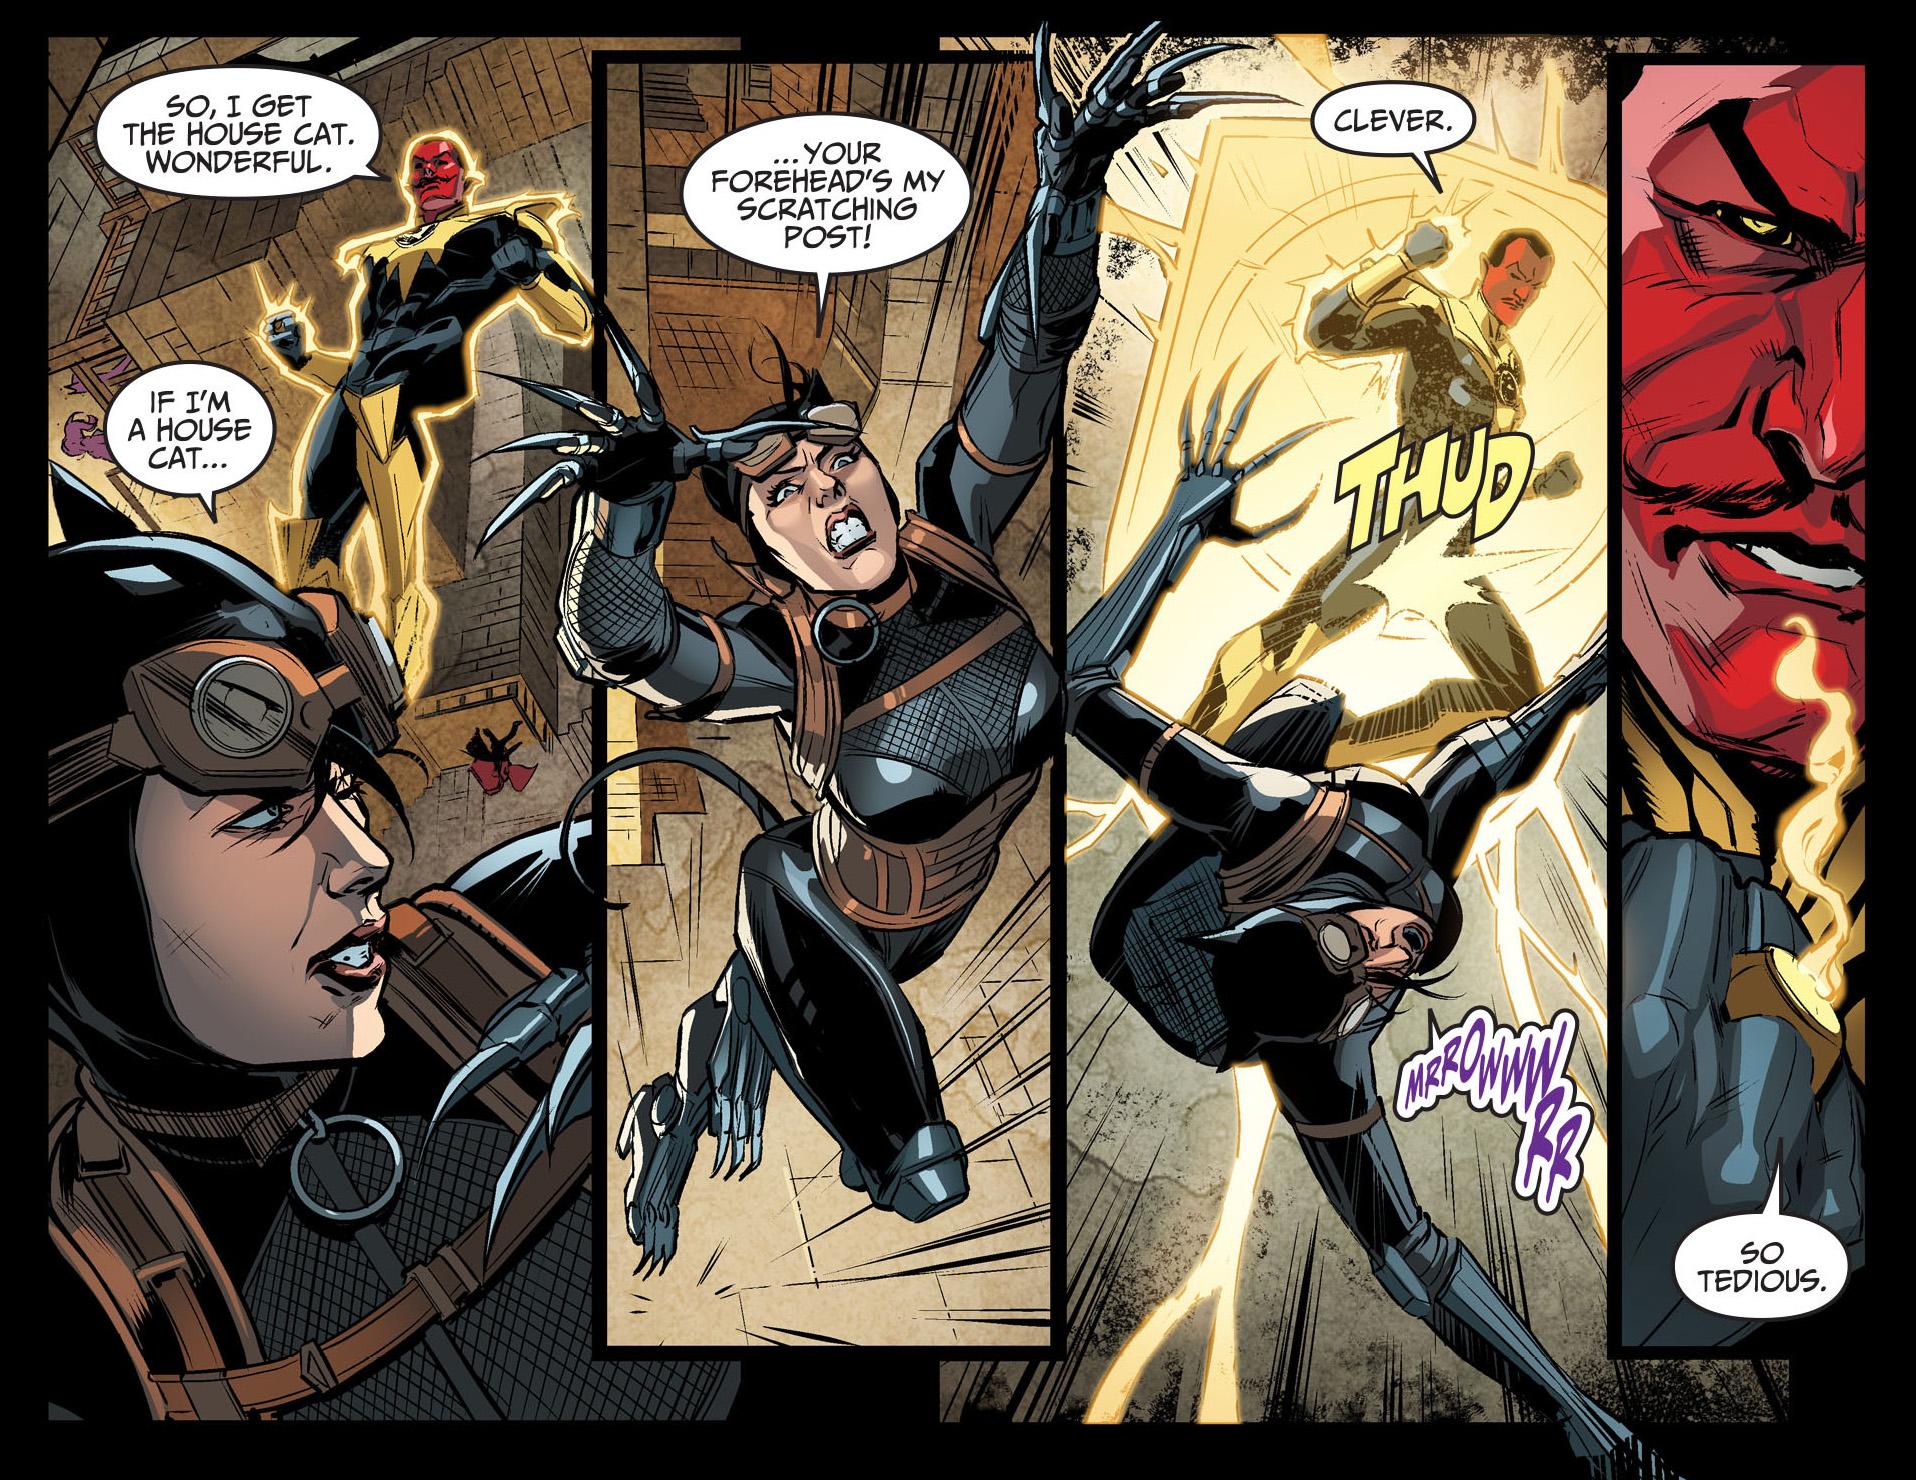 sinestro vs catwoman (injustice gods among us)